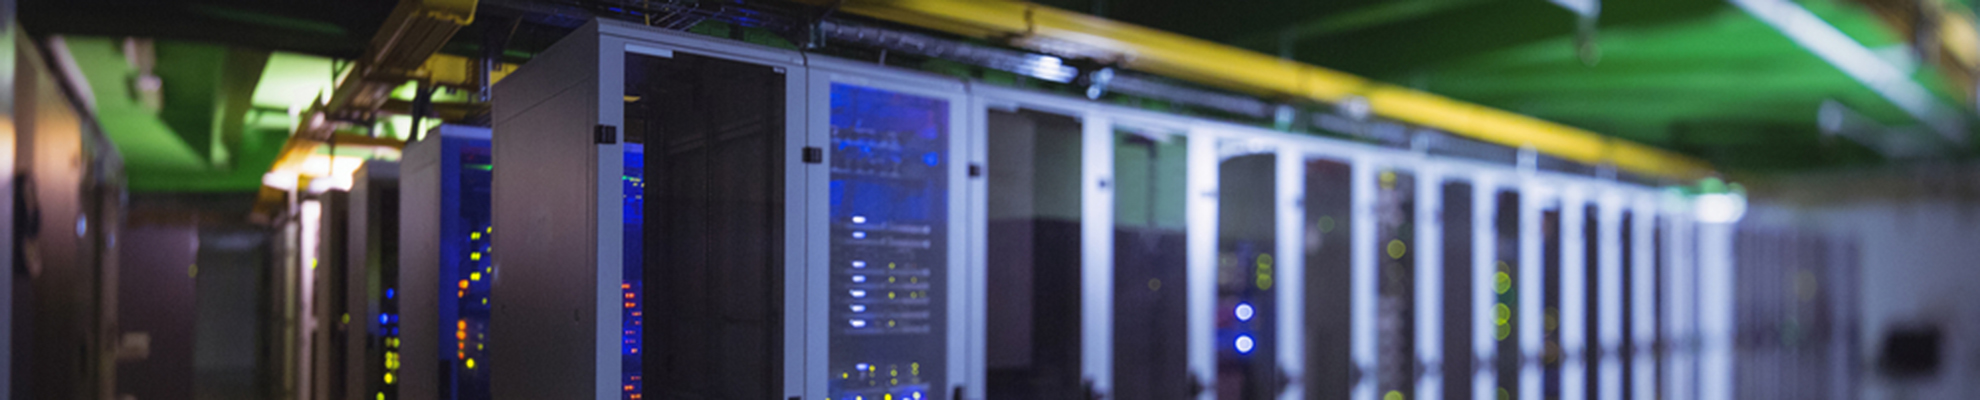 Data centre strip